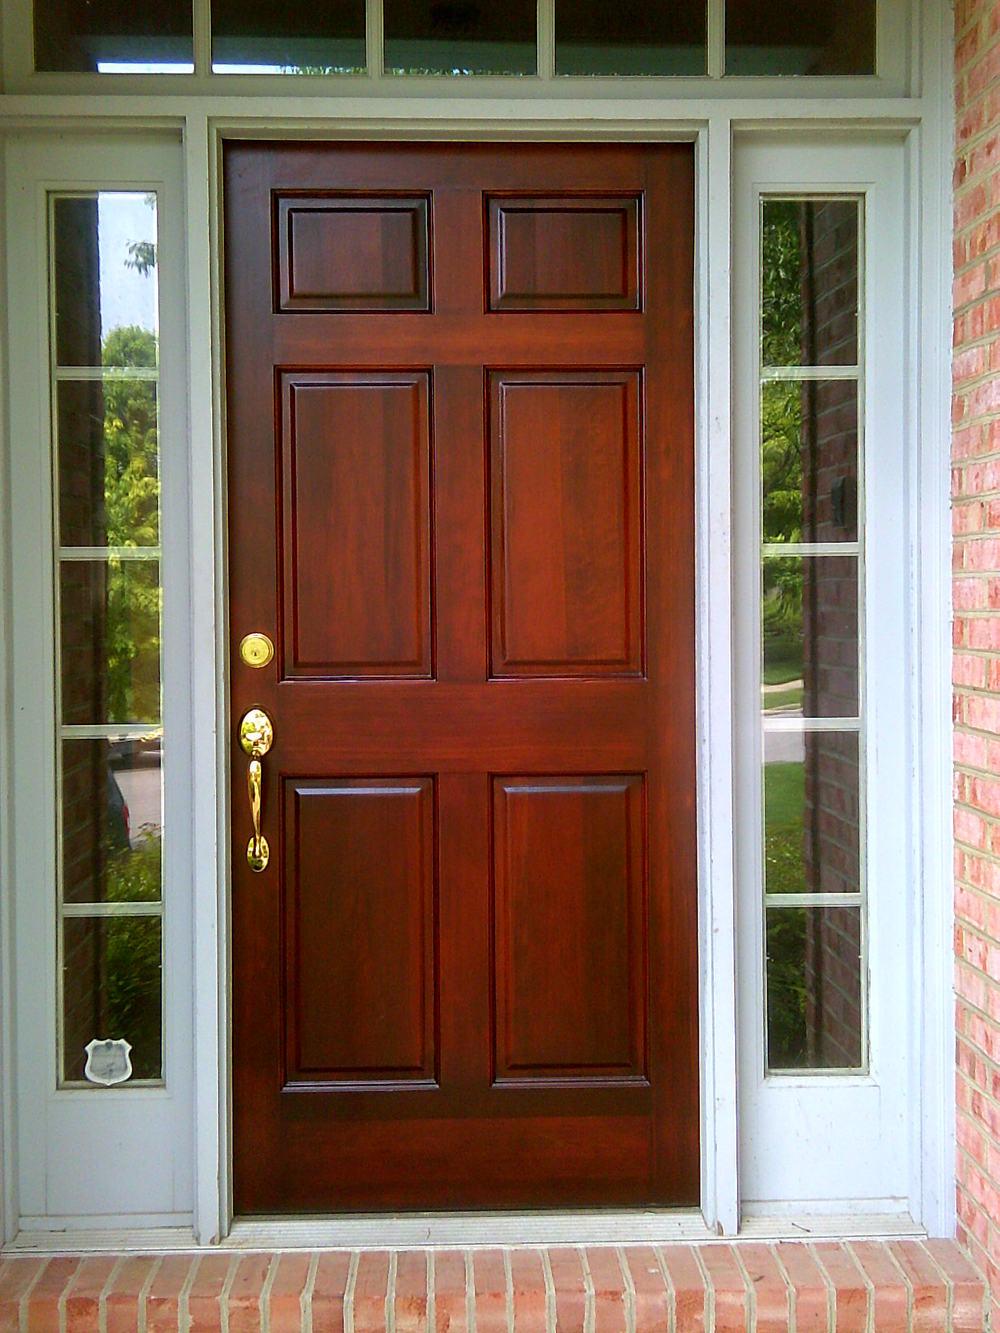 Door Renew Restore wood companies refinishing refinish replace replacing wooden new